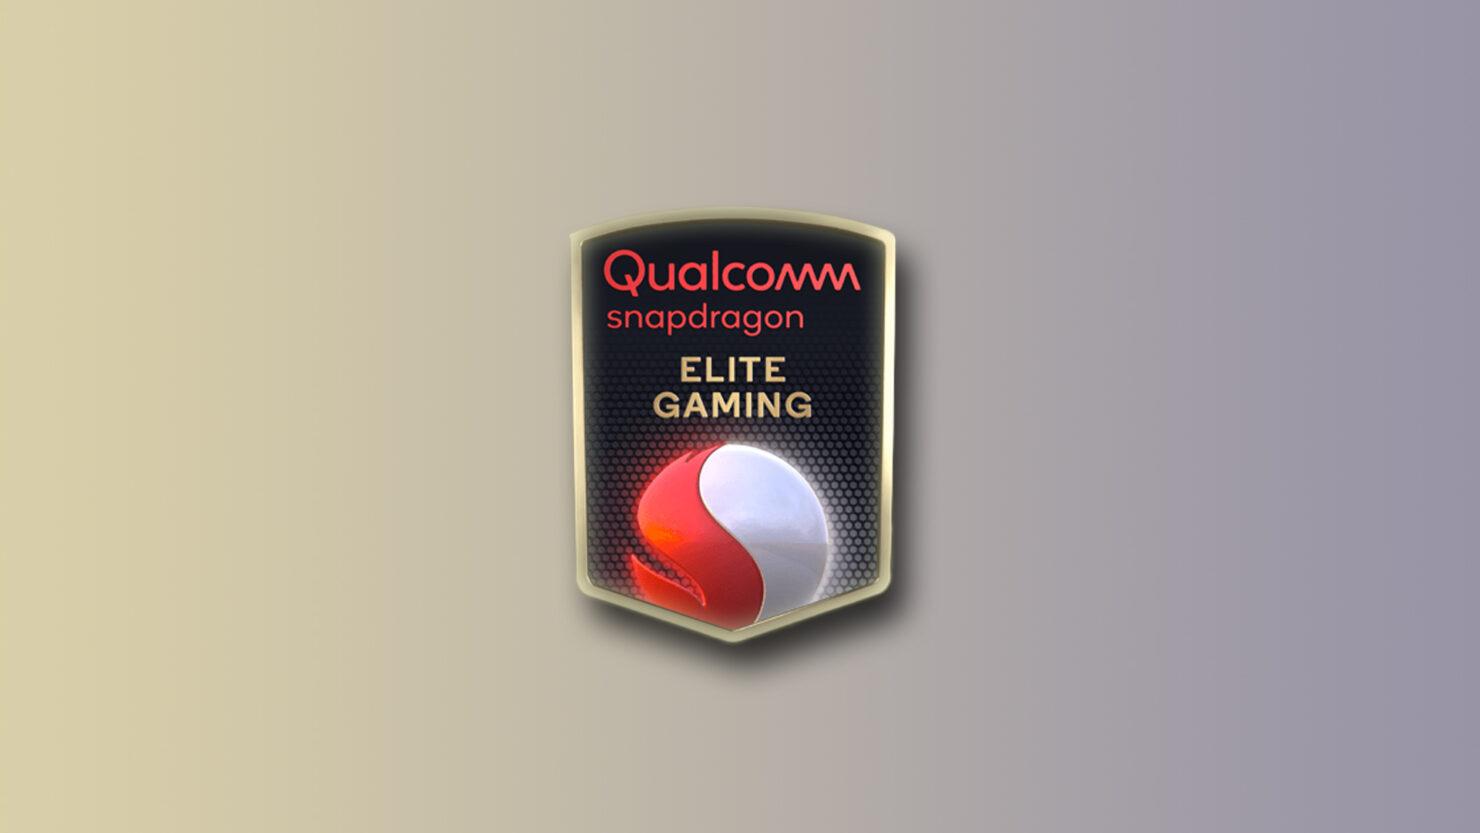 Qualcomm Snapdragon Elite Gaming